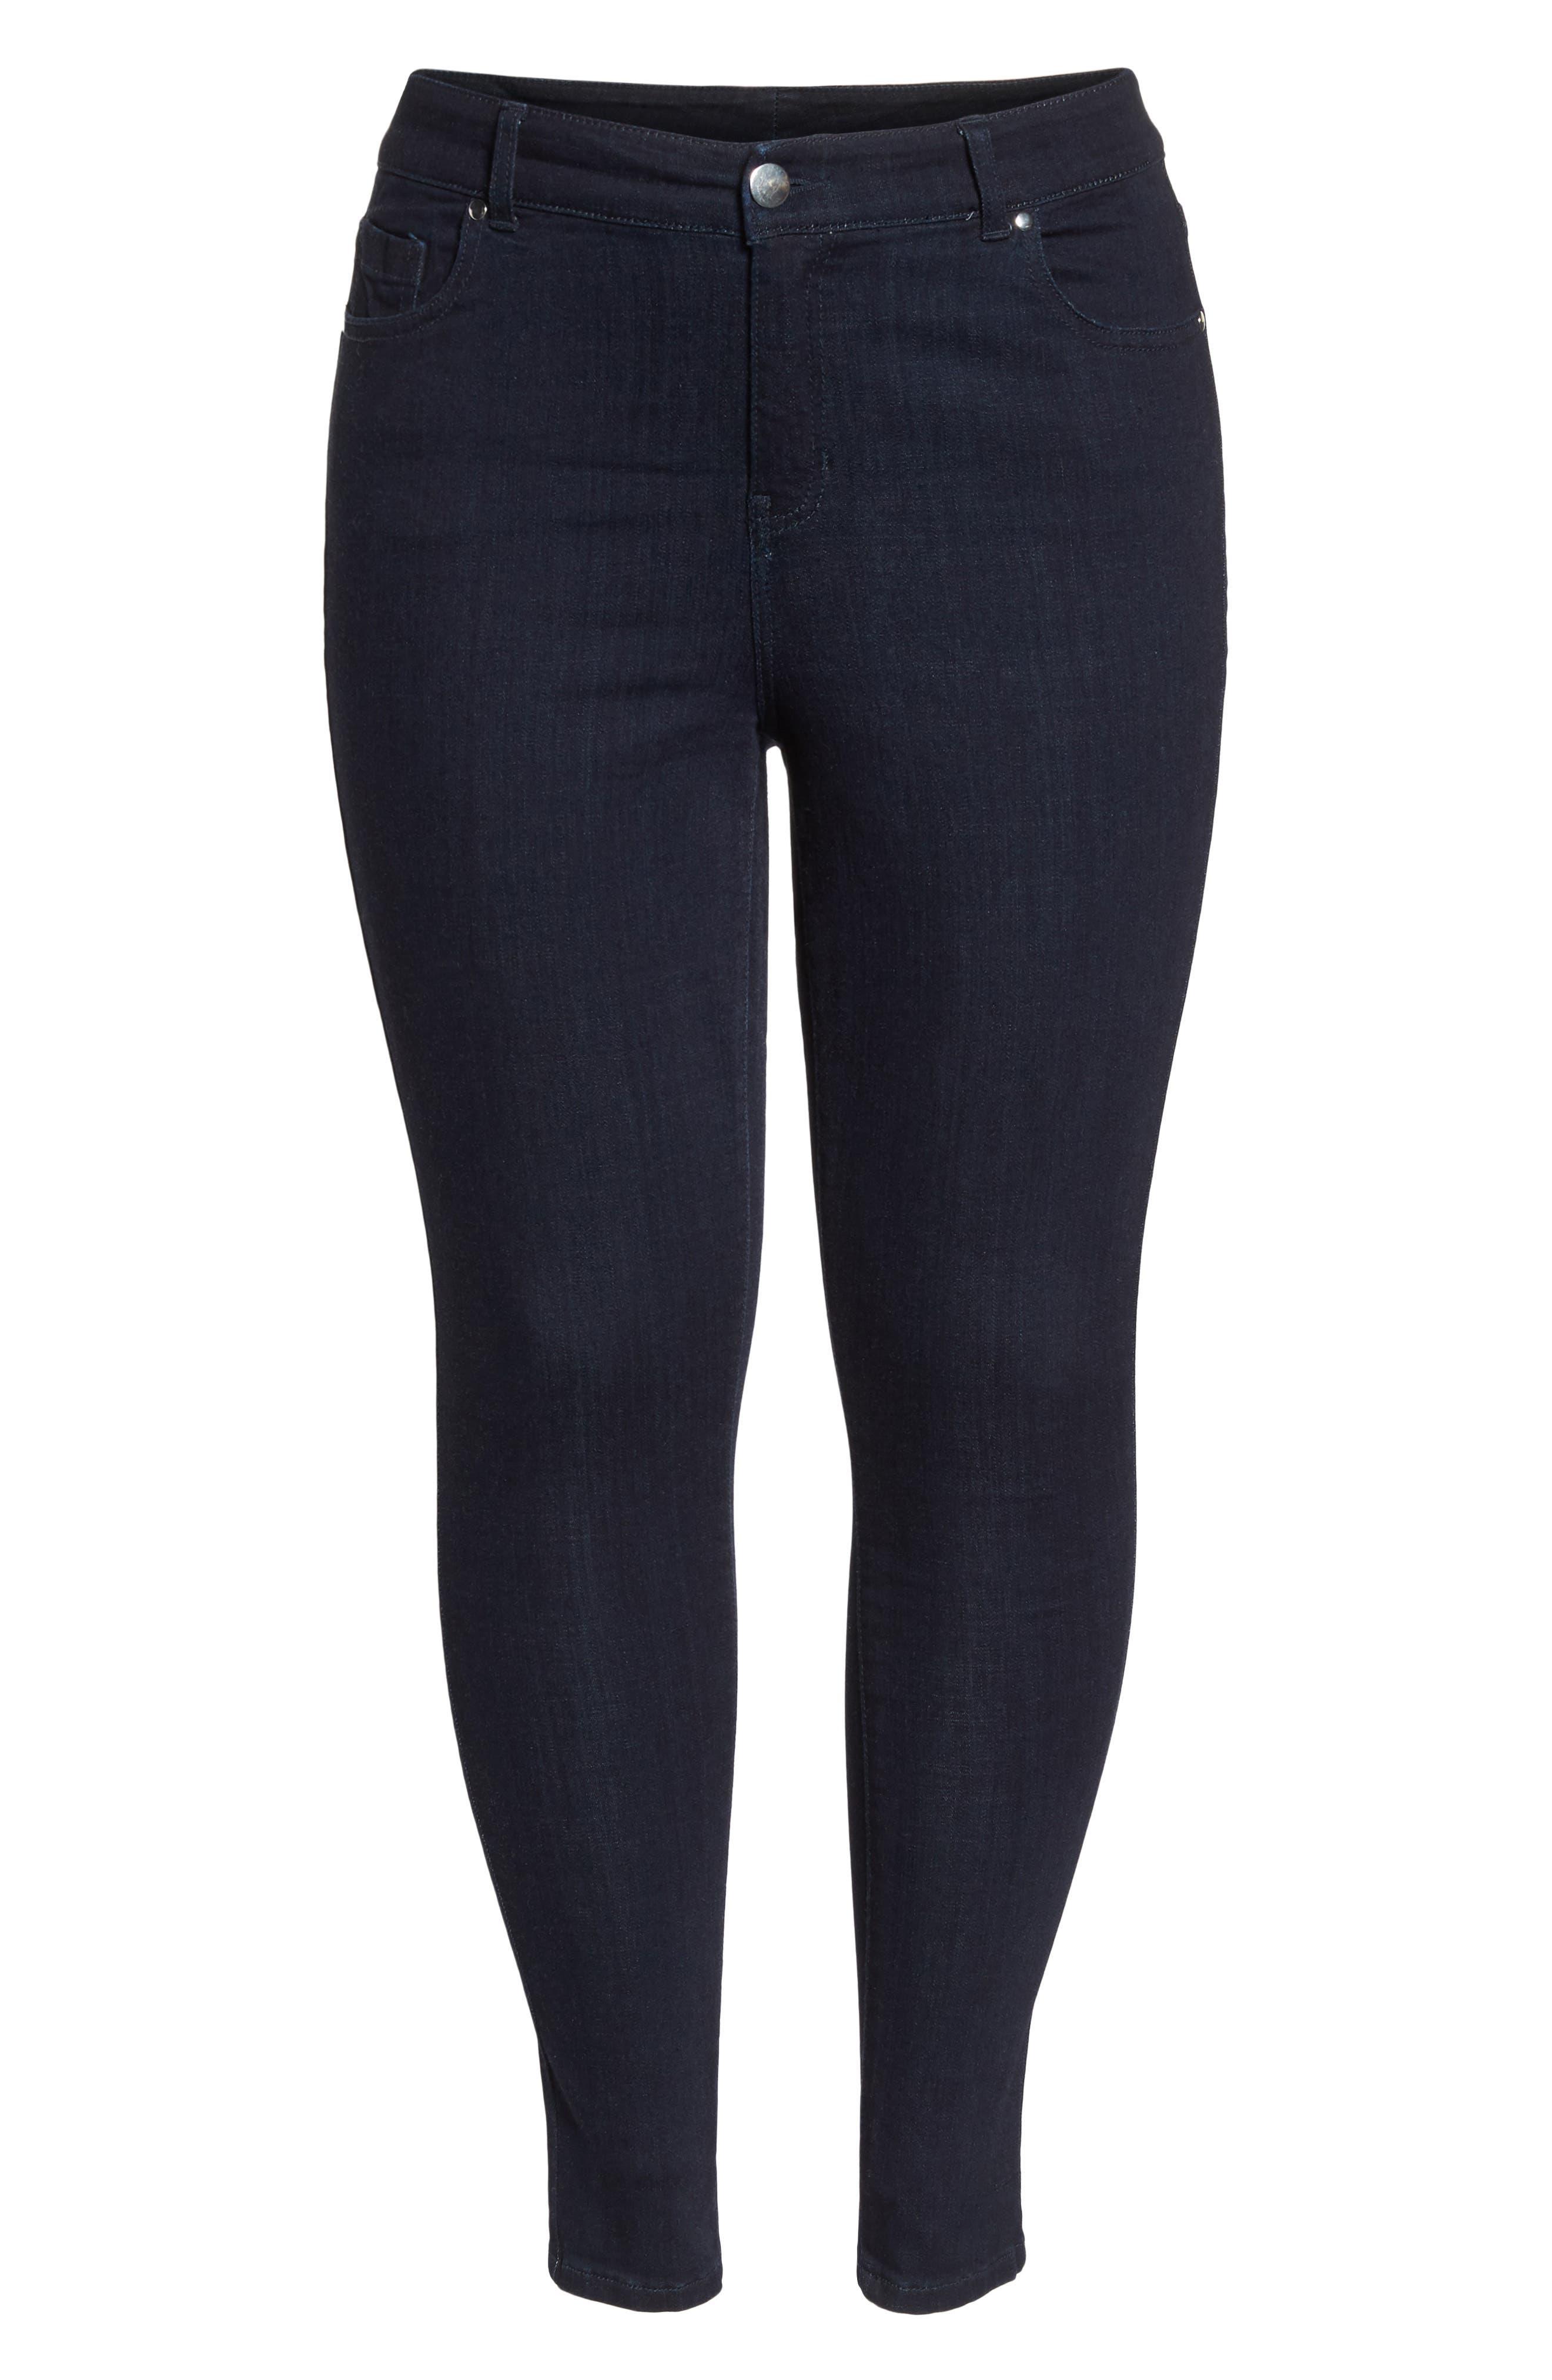 Stretch Skinny Jeans,                             Alternate thumbnail 7, color,                             DARK RINSE